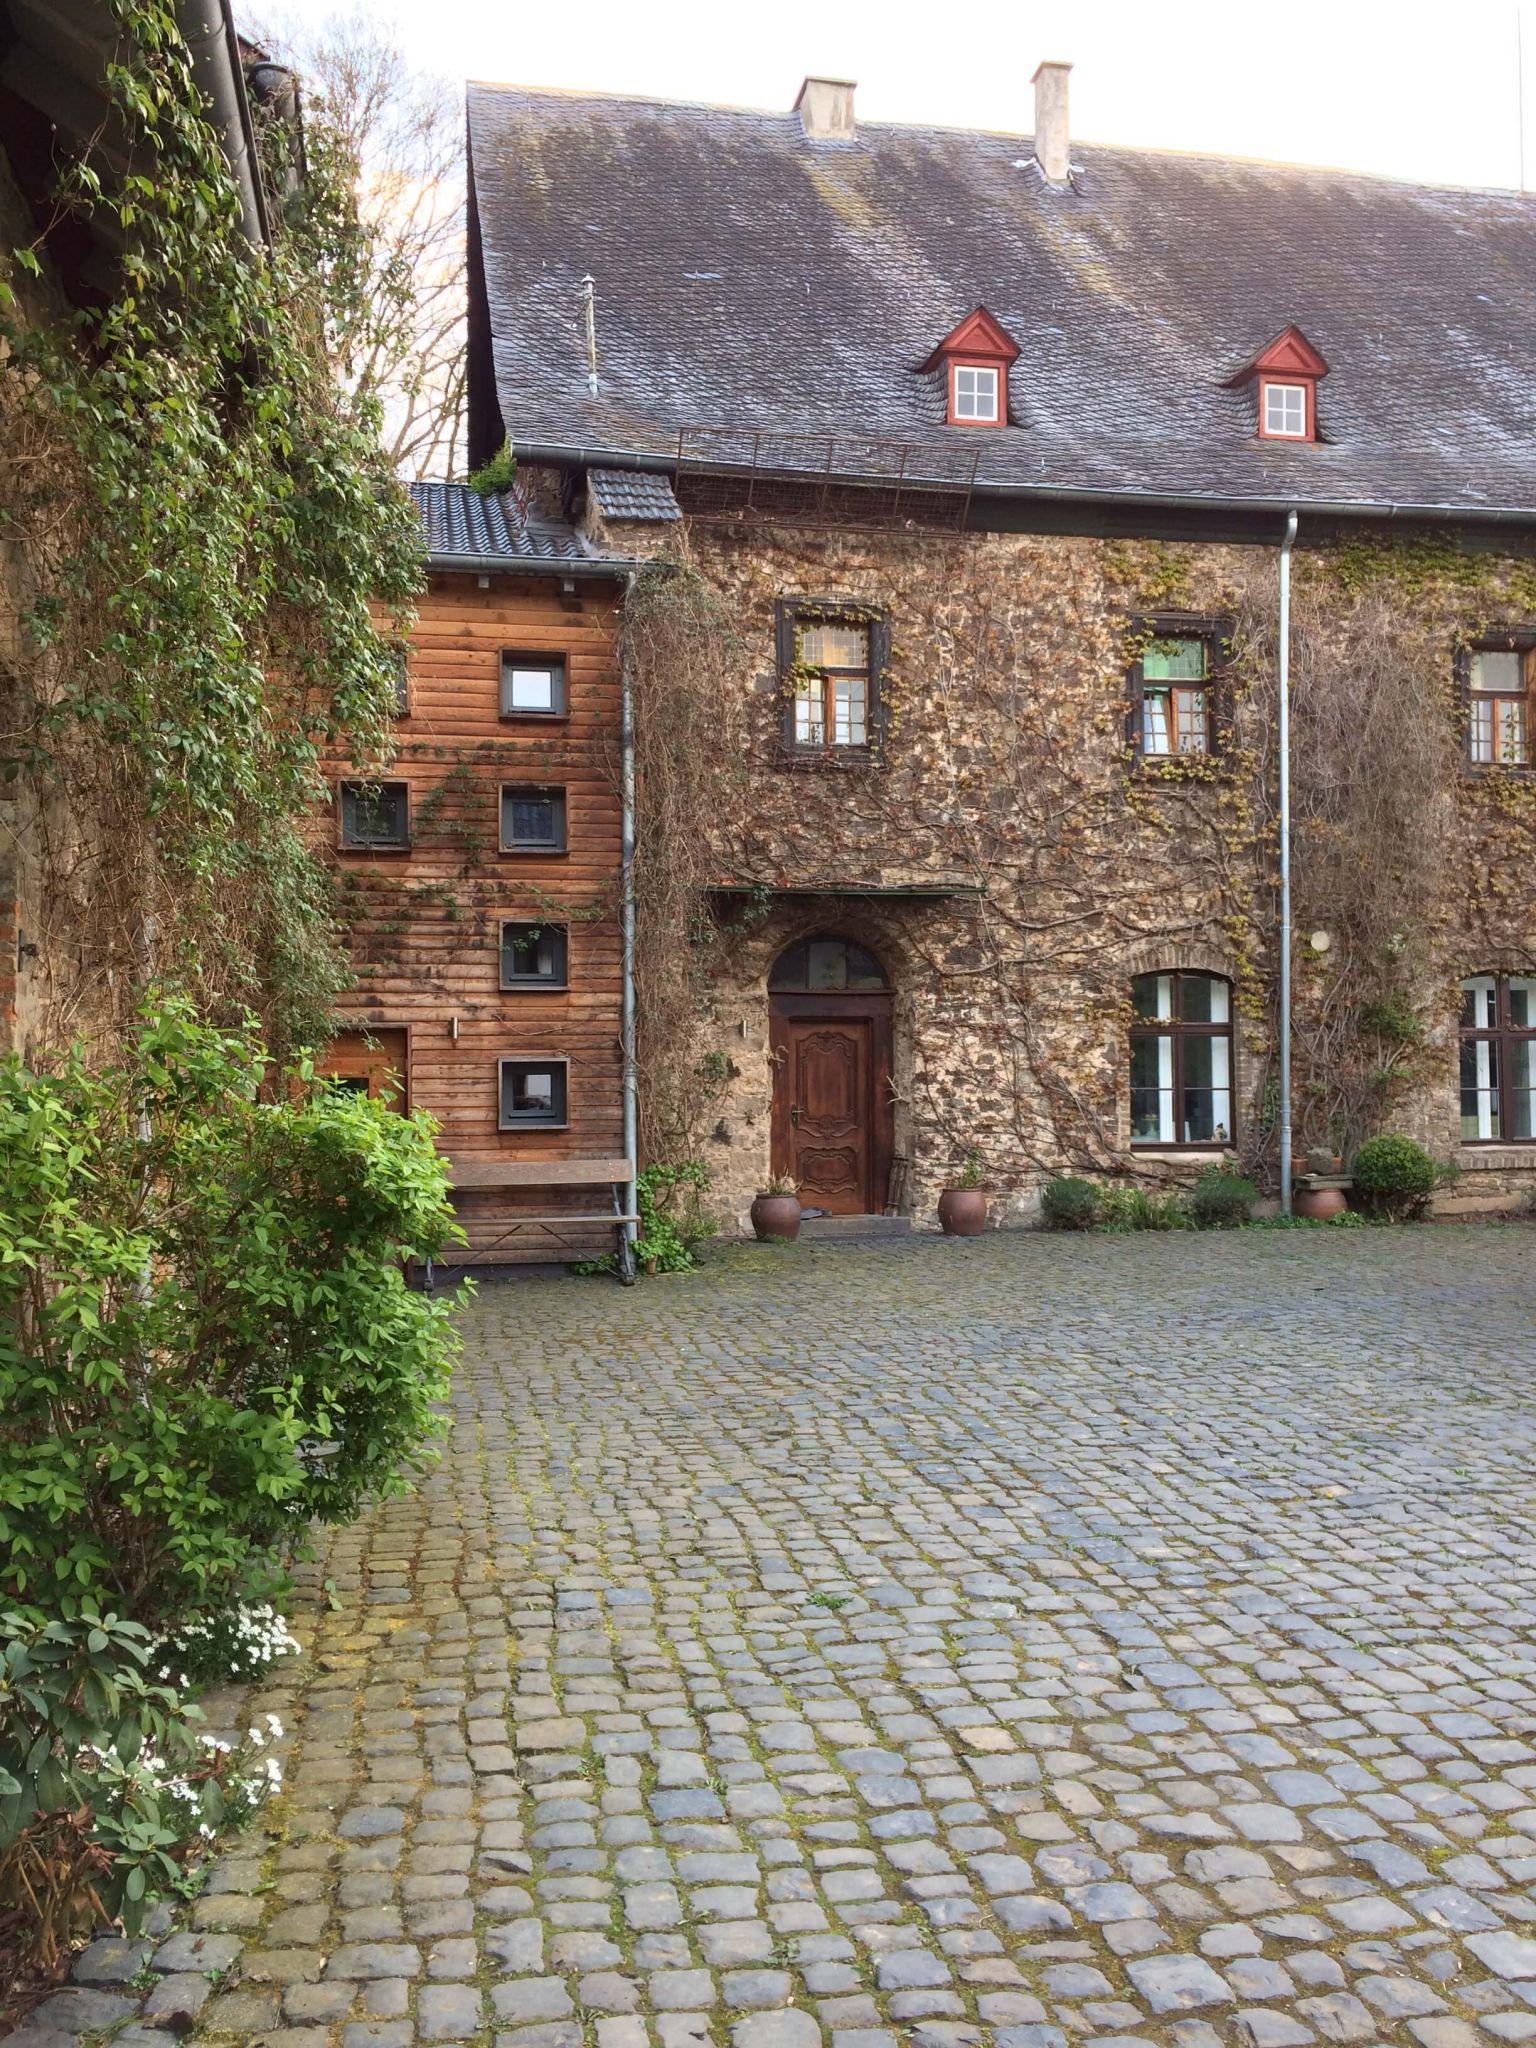 kloster schweinheim silvester